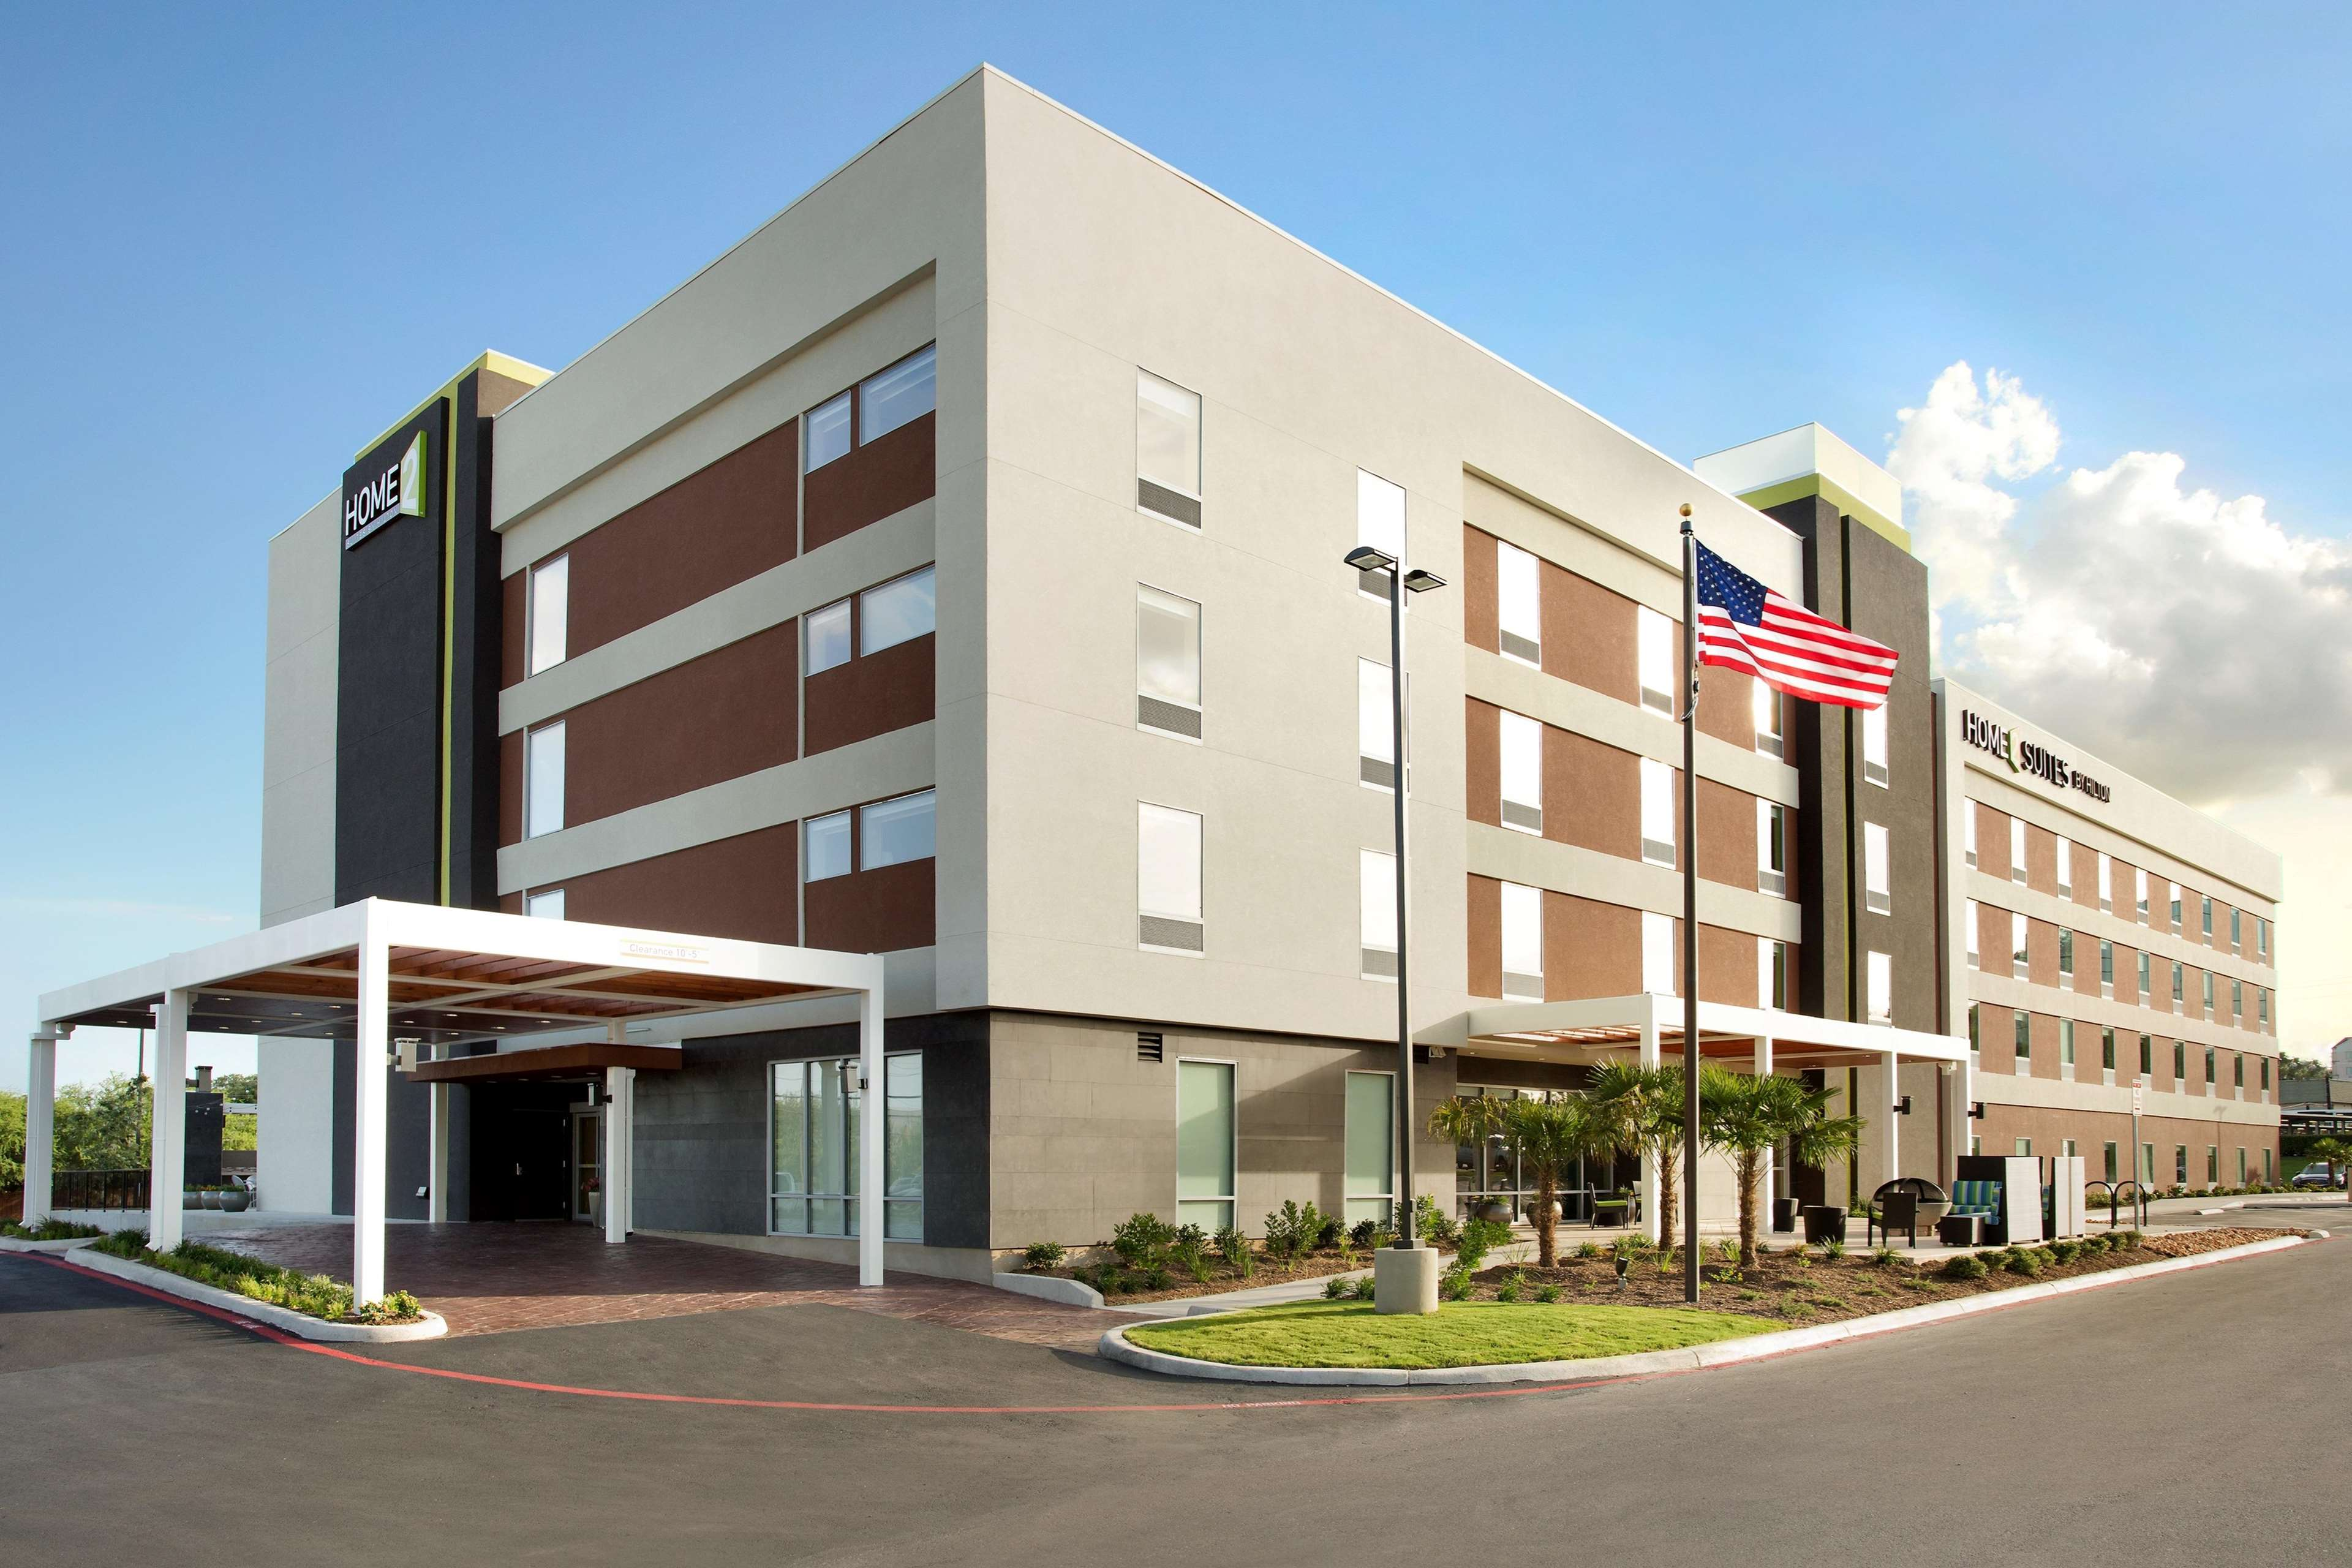 Home2 Suites by Hilton San Antonio Airport, TX image 4